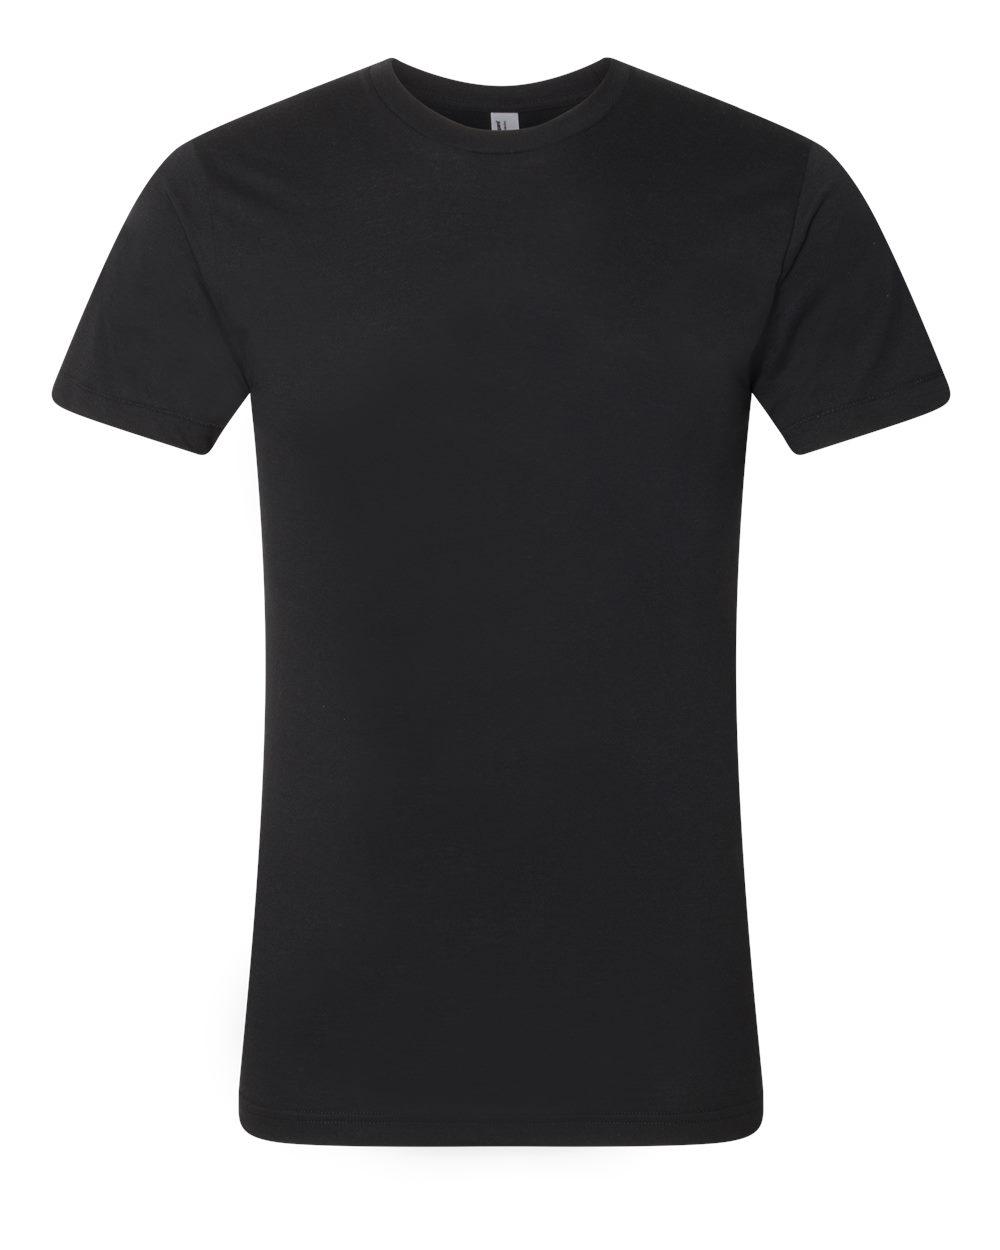 American-Apparel-Mens-Slim-Fit-50-50-Cotton-T-Shirt-Tee-BB401W-up-to-2XL thumbnail 9